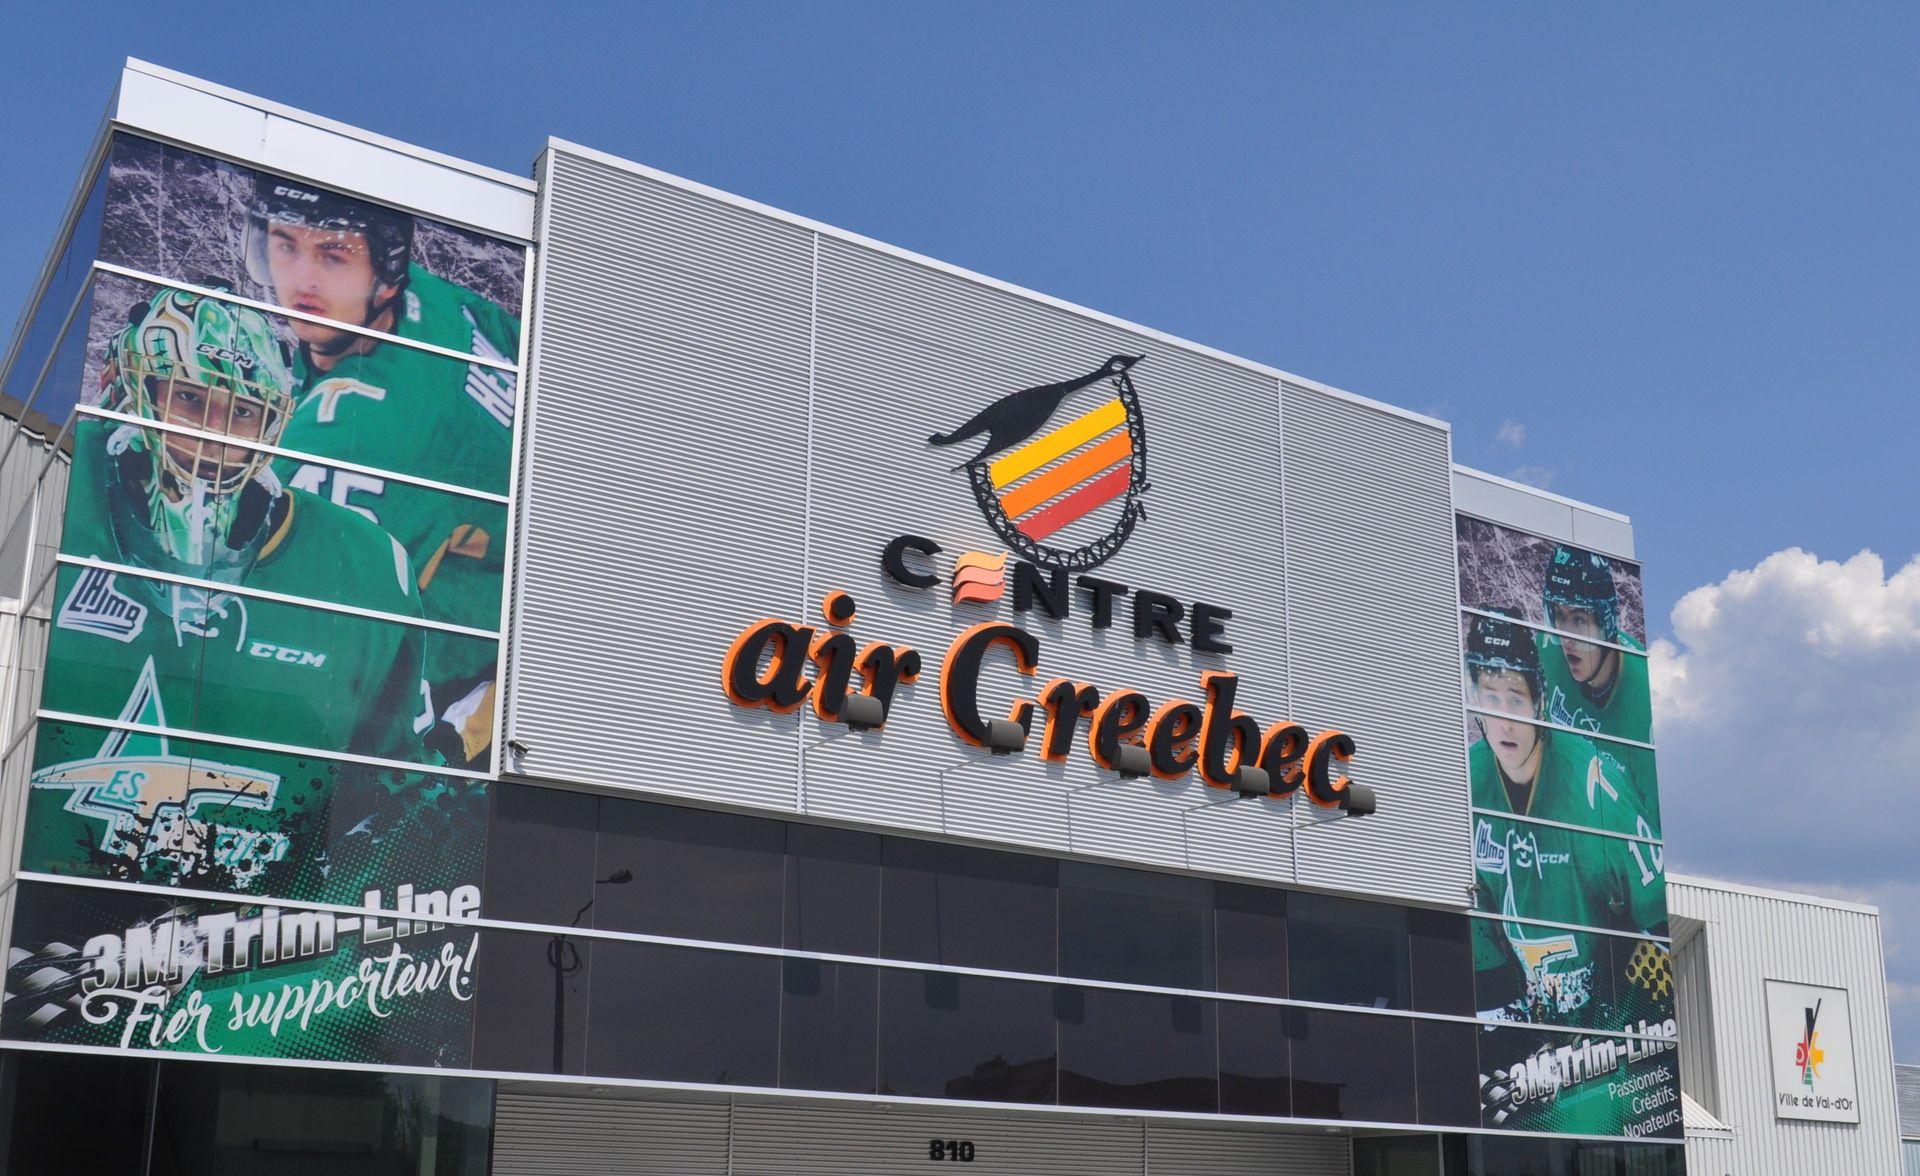 centre-air-creebec.JPG (323 KB)